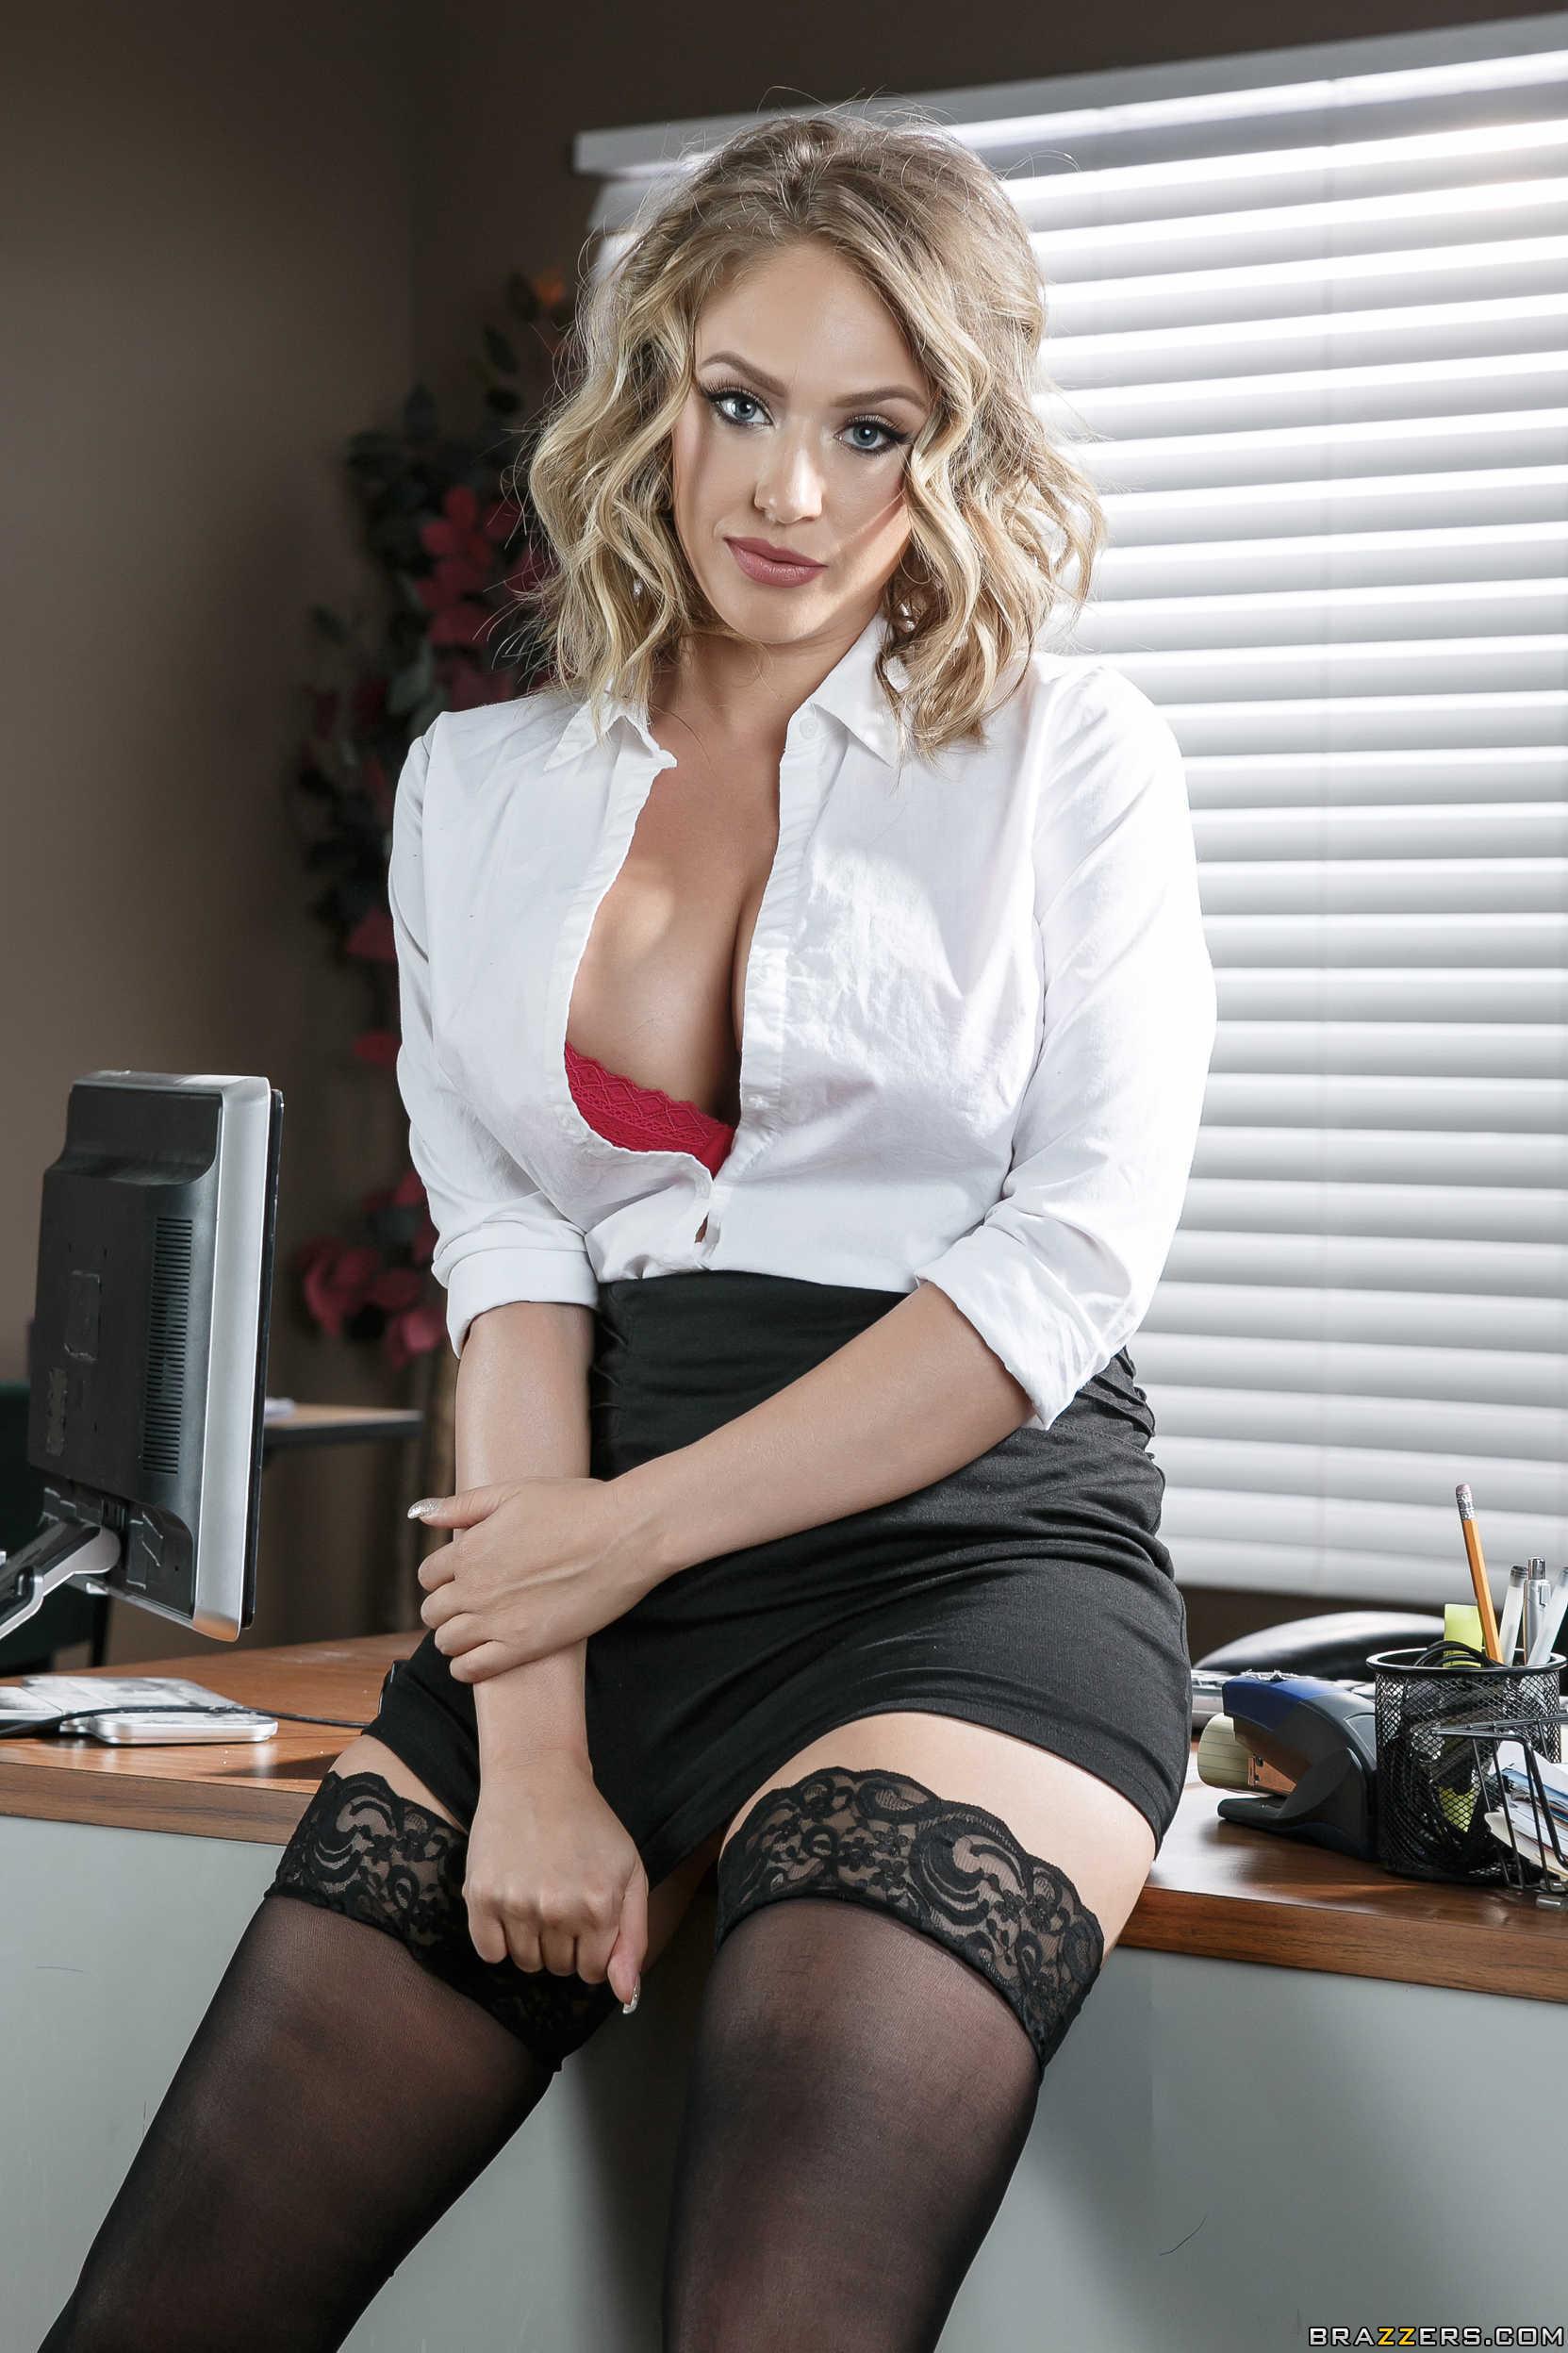 Kagney Linn Karter - una secretaria muy cachonda